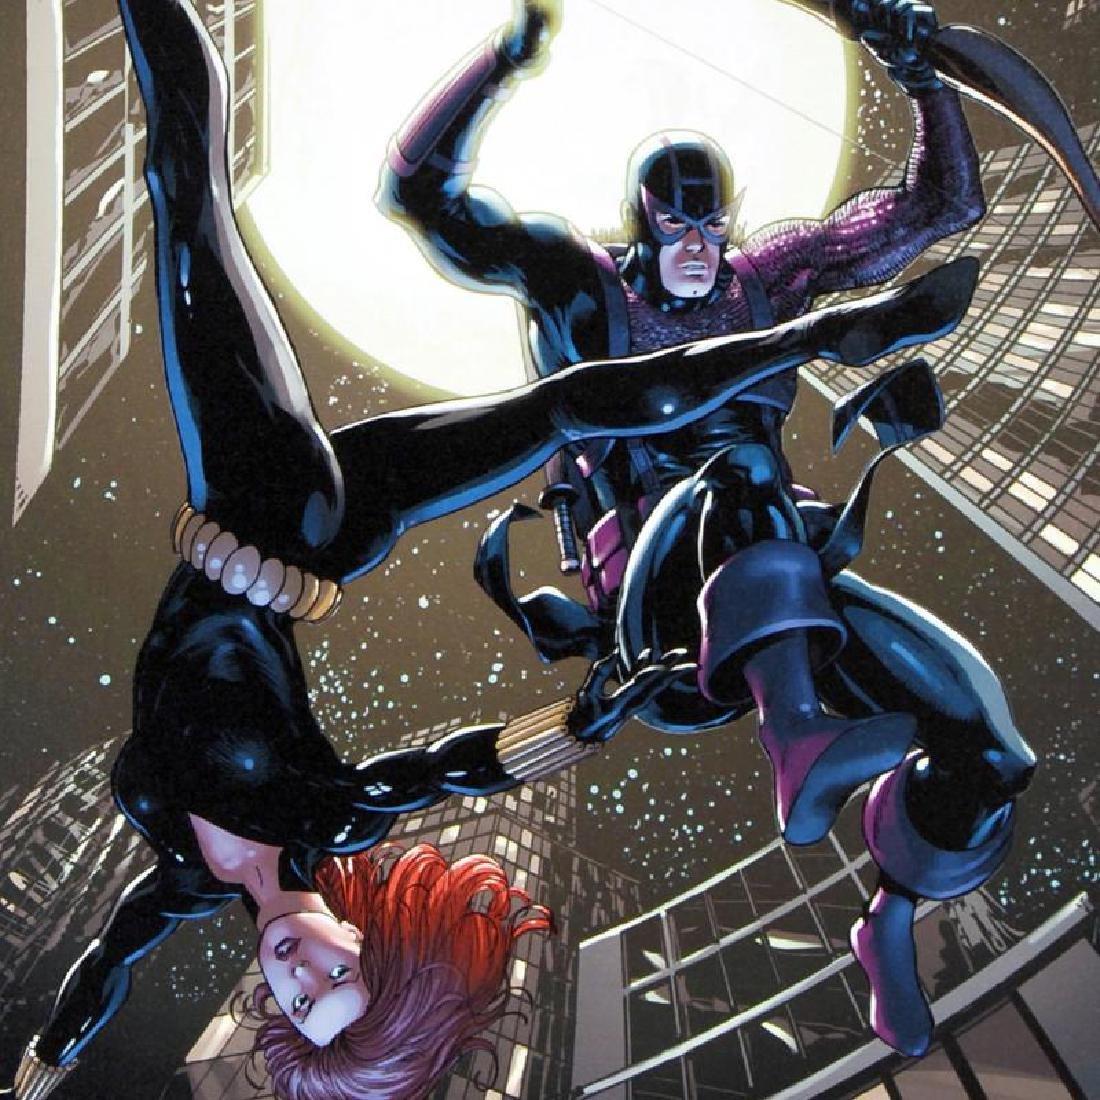 Marvel Adventure Super Heroes #17 by Marvel Comics - 2